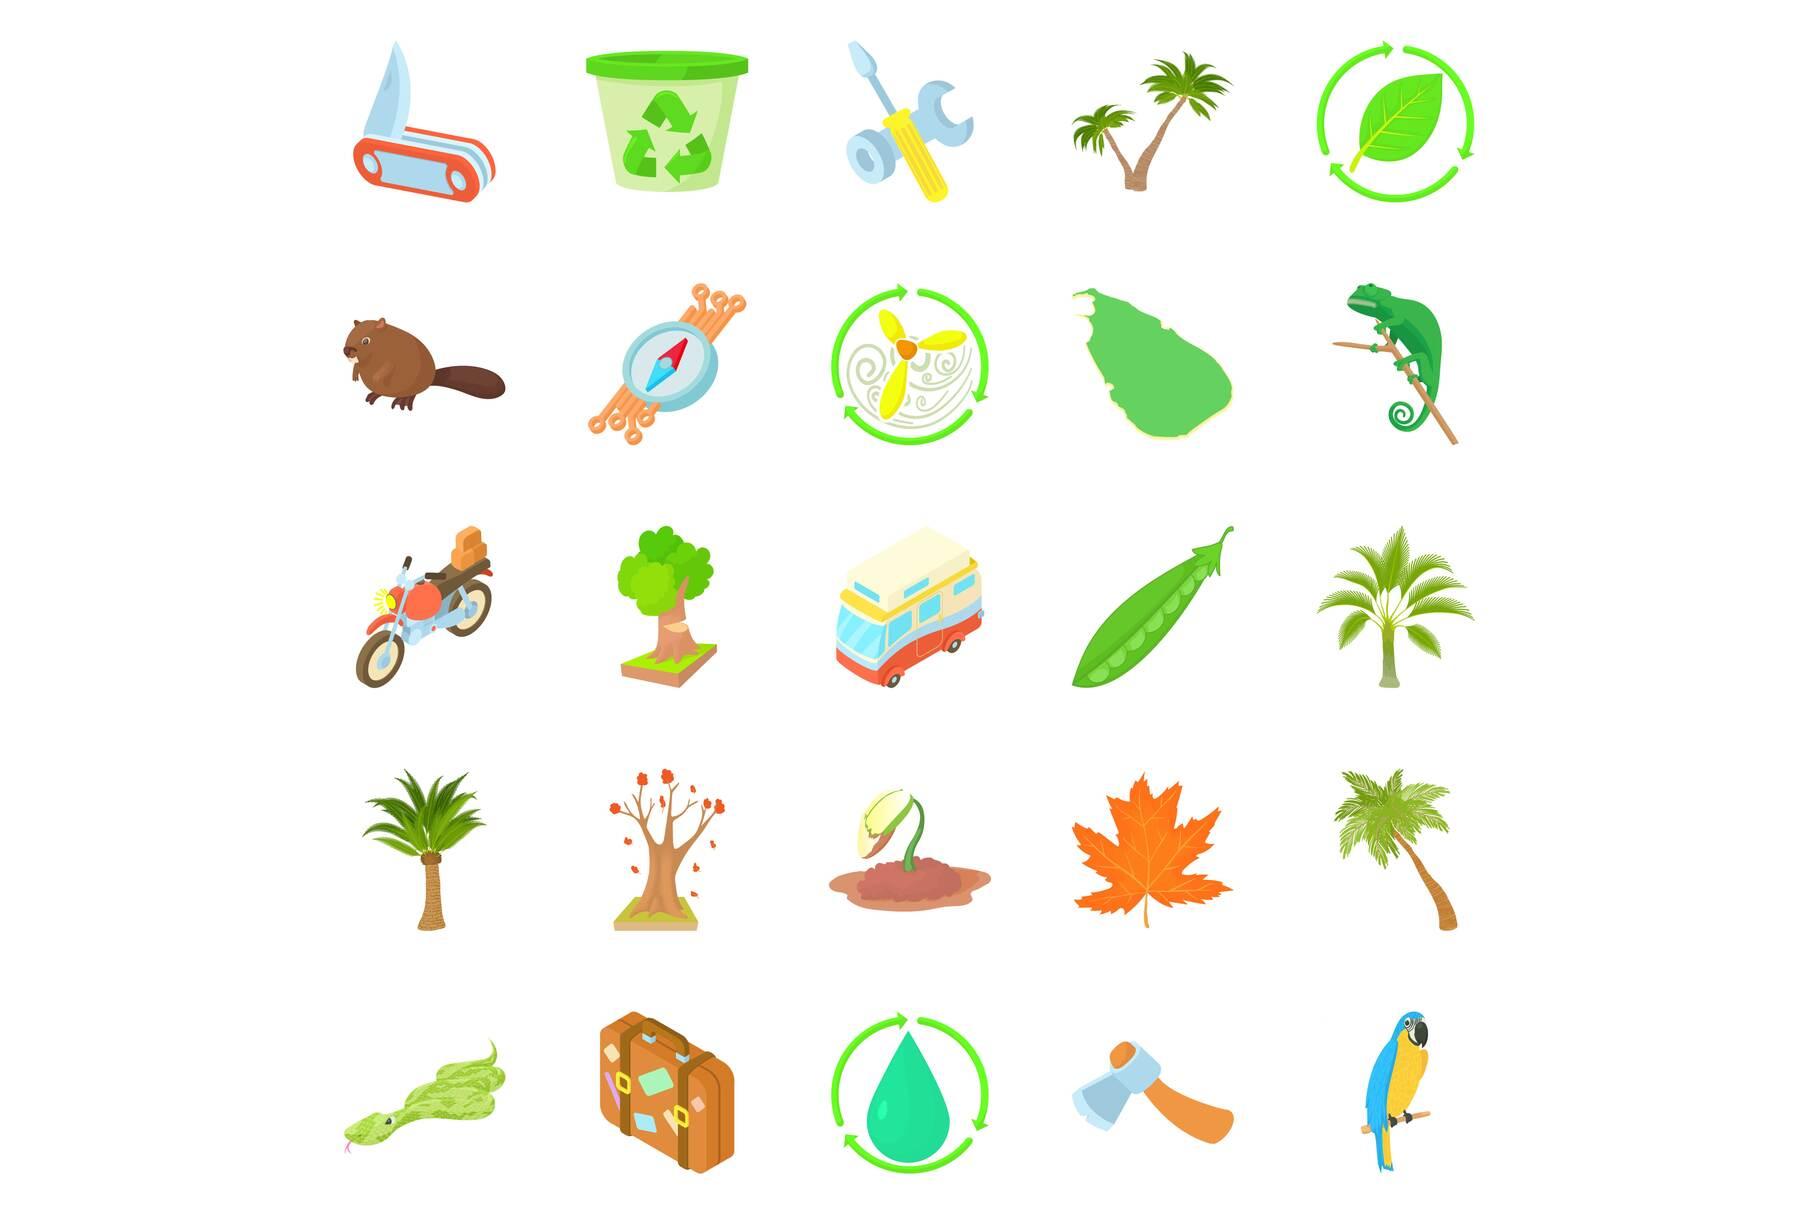 Tourist meeting icons set, cartoon style example image 1